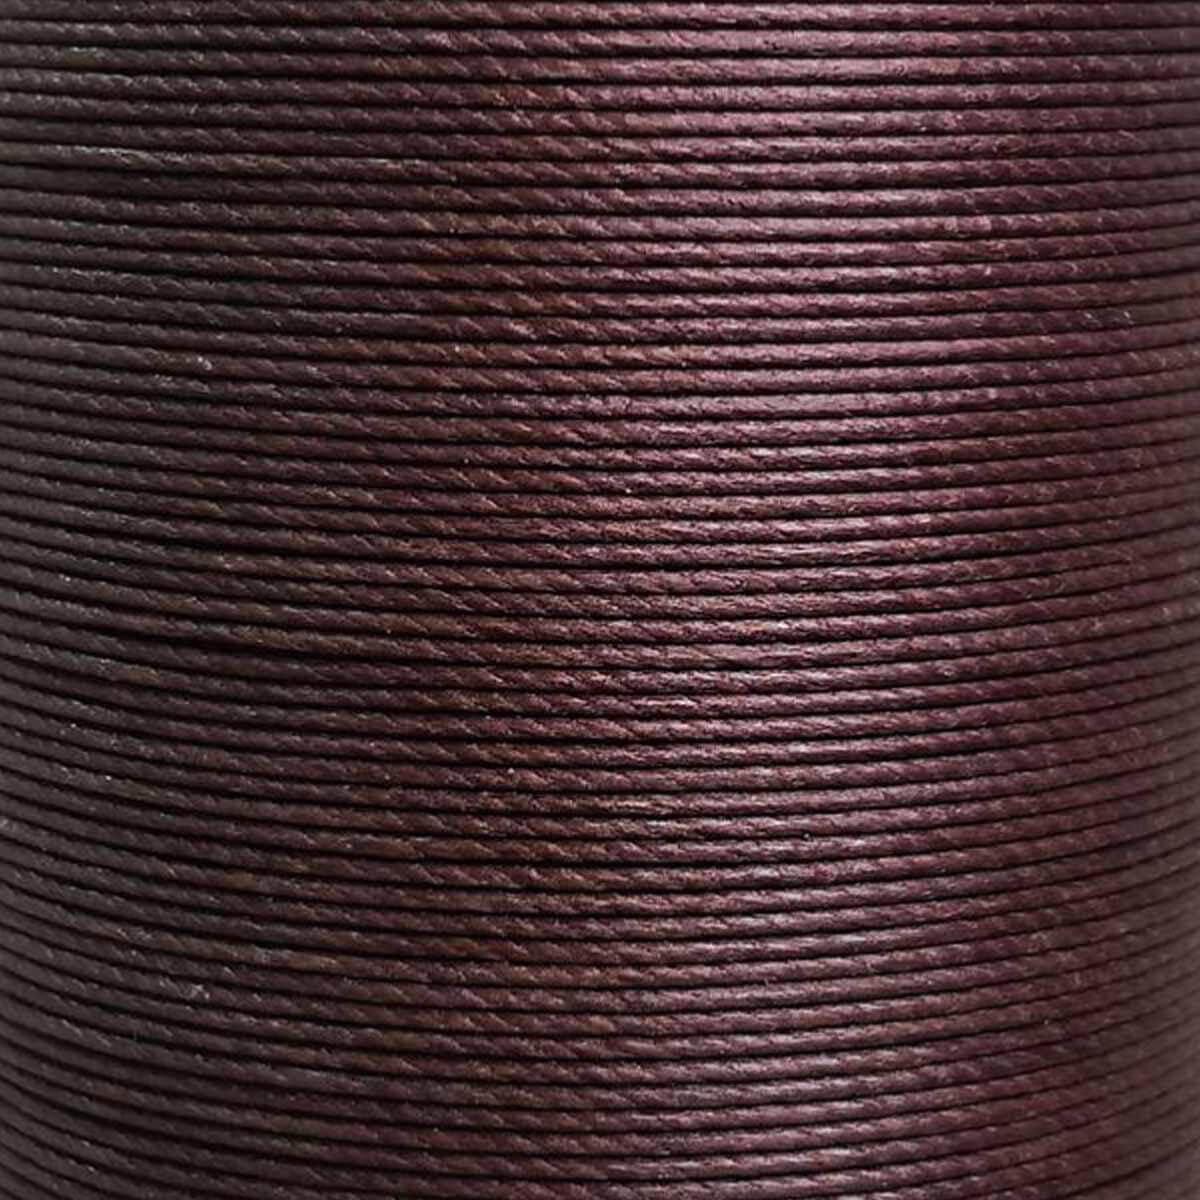 Bobine de 25m de fil de lin ciré MeiSi M90 - 0,9 mm - CAFÉ - MS002